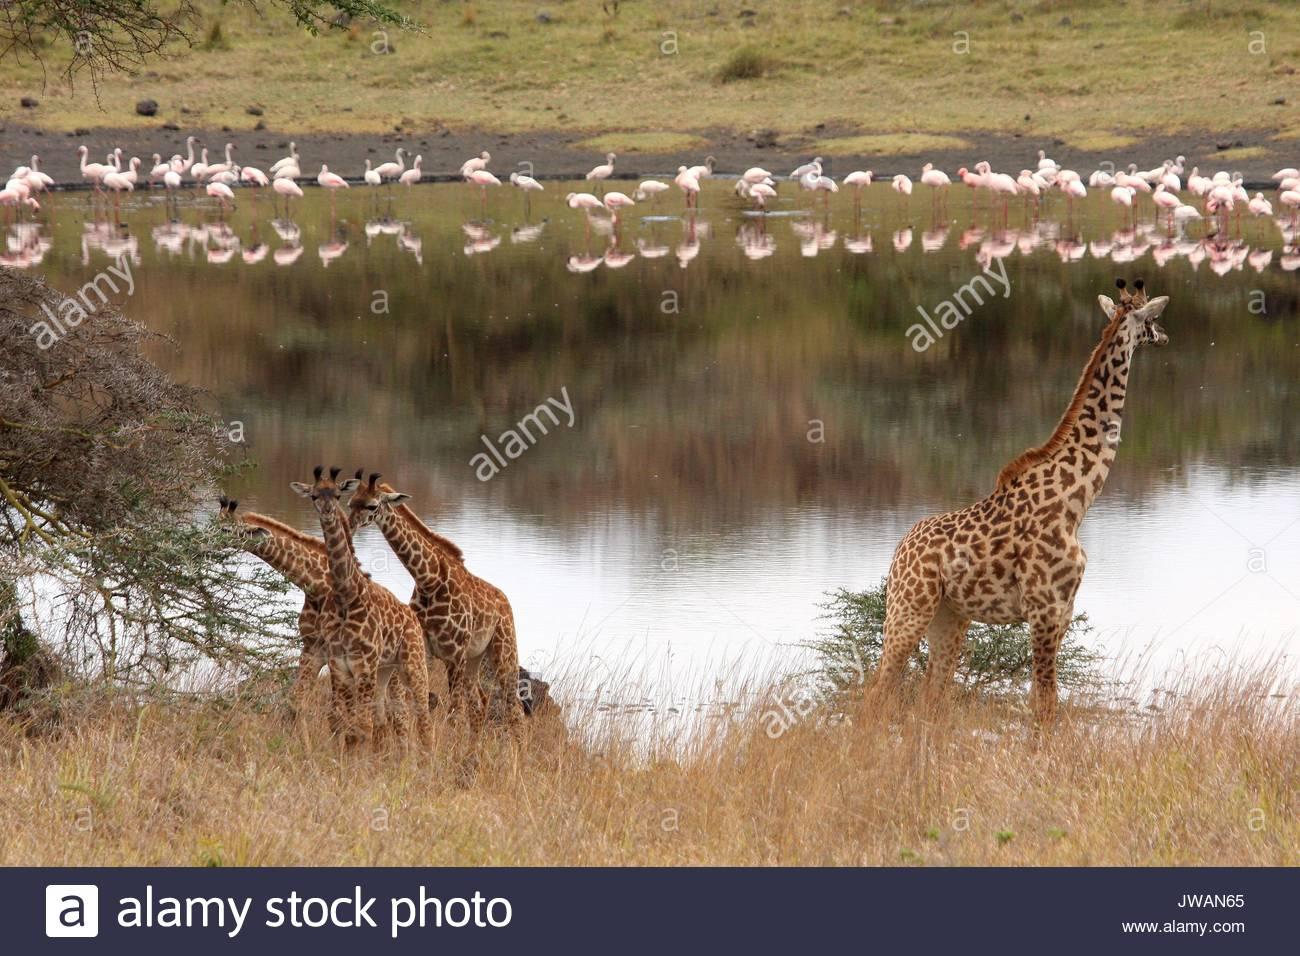 Giraffe and lesser flamingos. - Stock Image